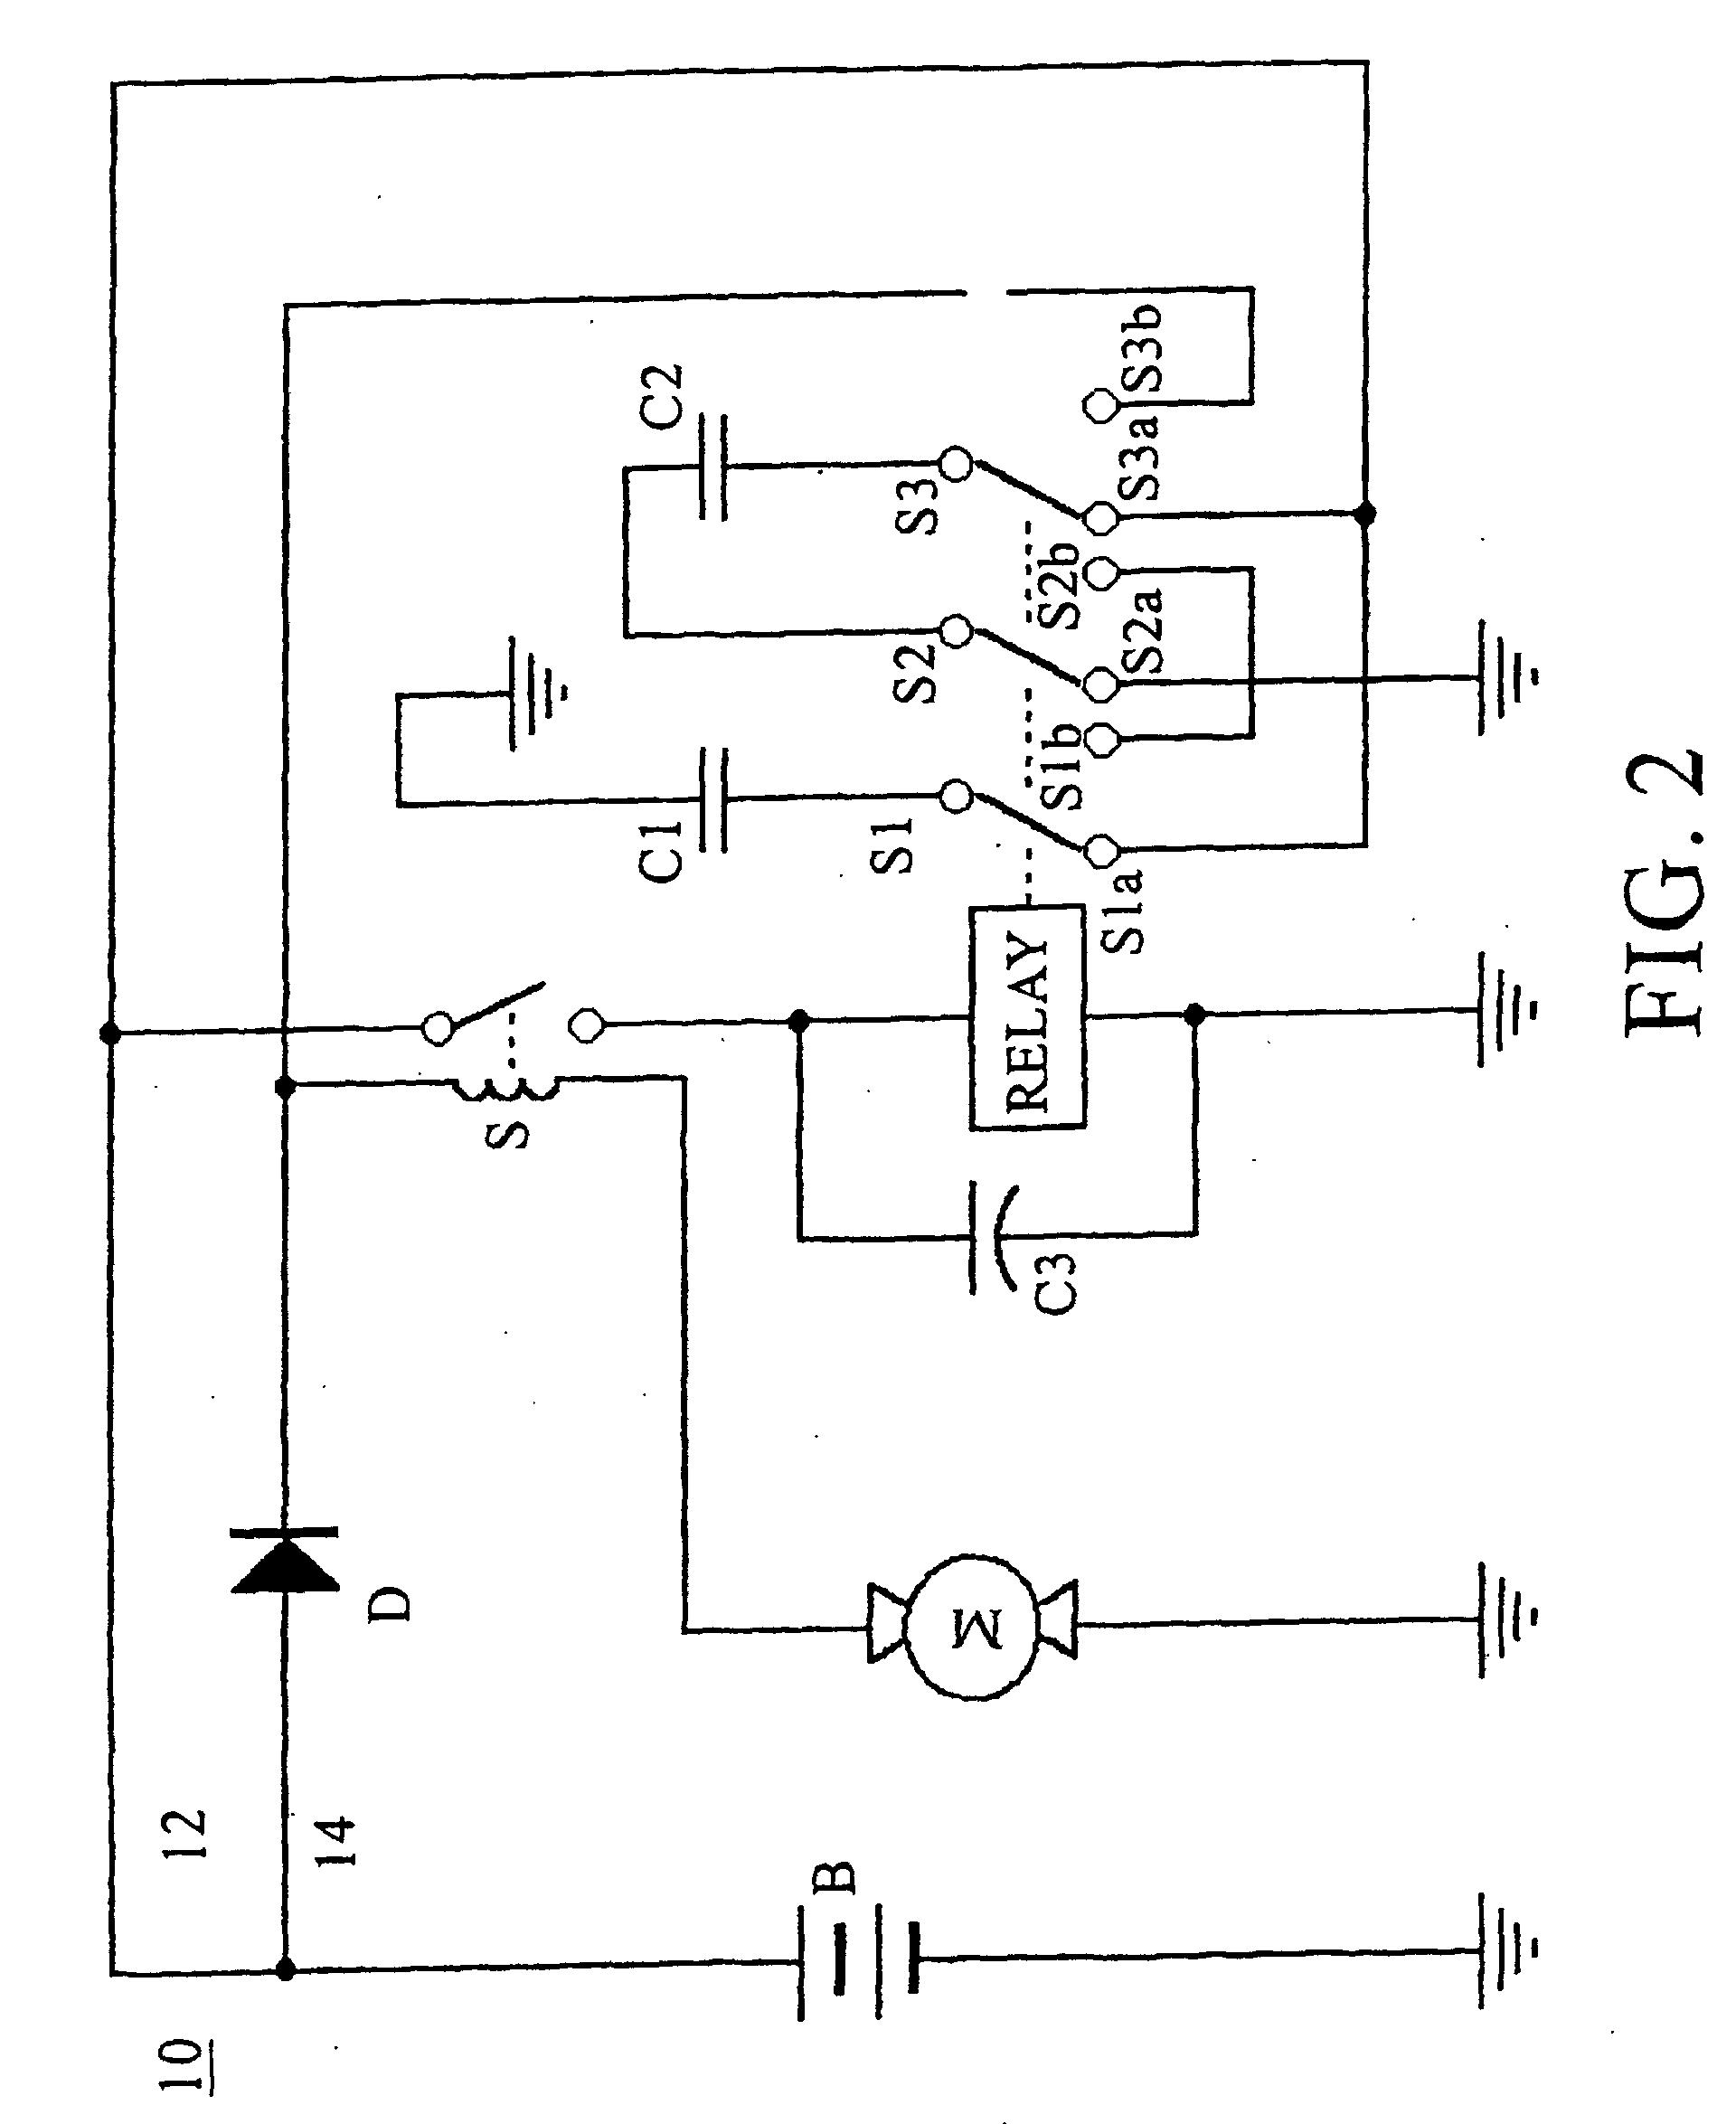 patent ep1363386b1 - high current pulse generator